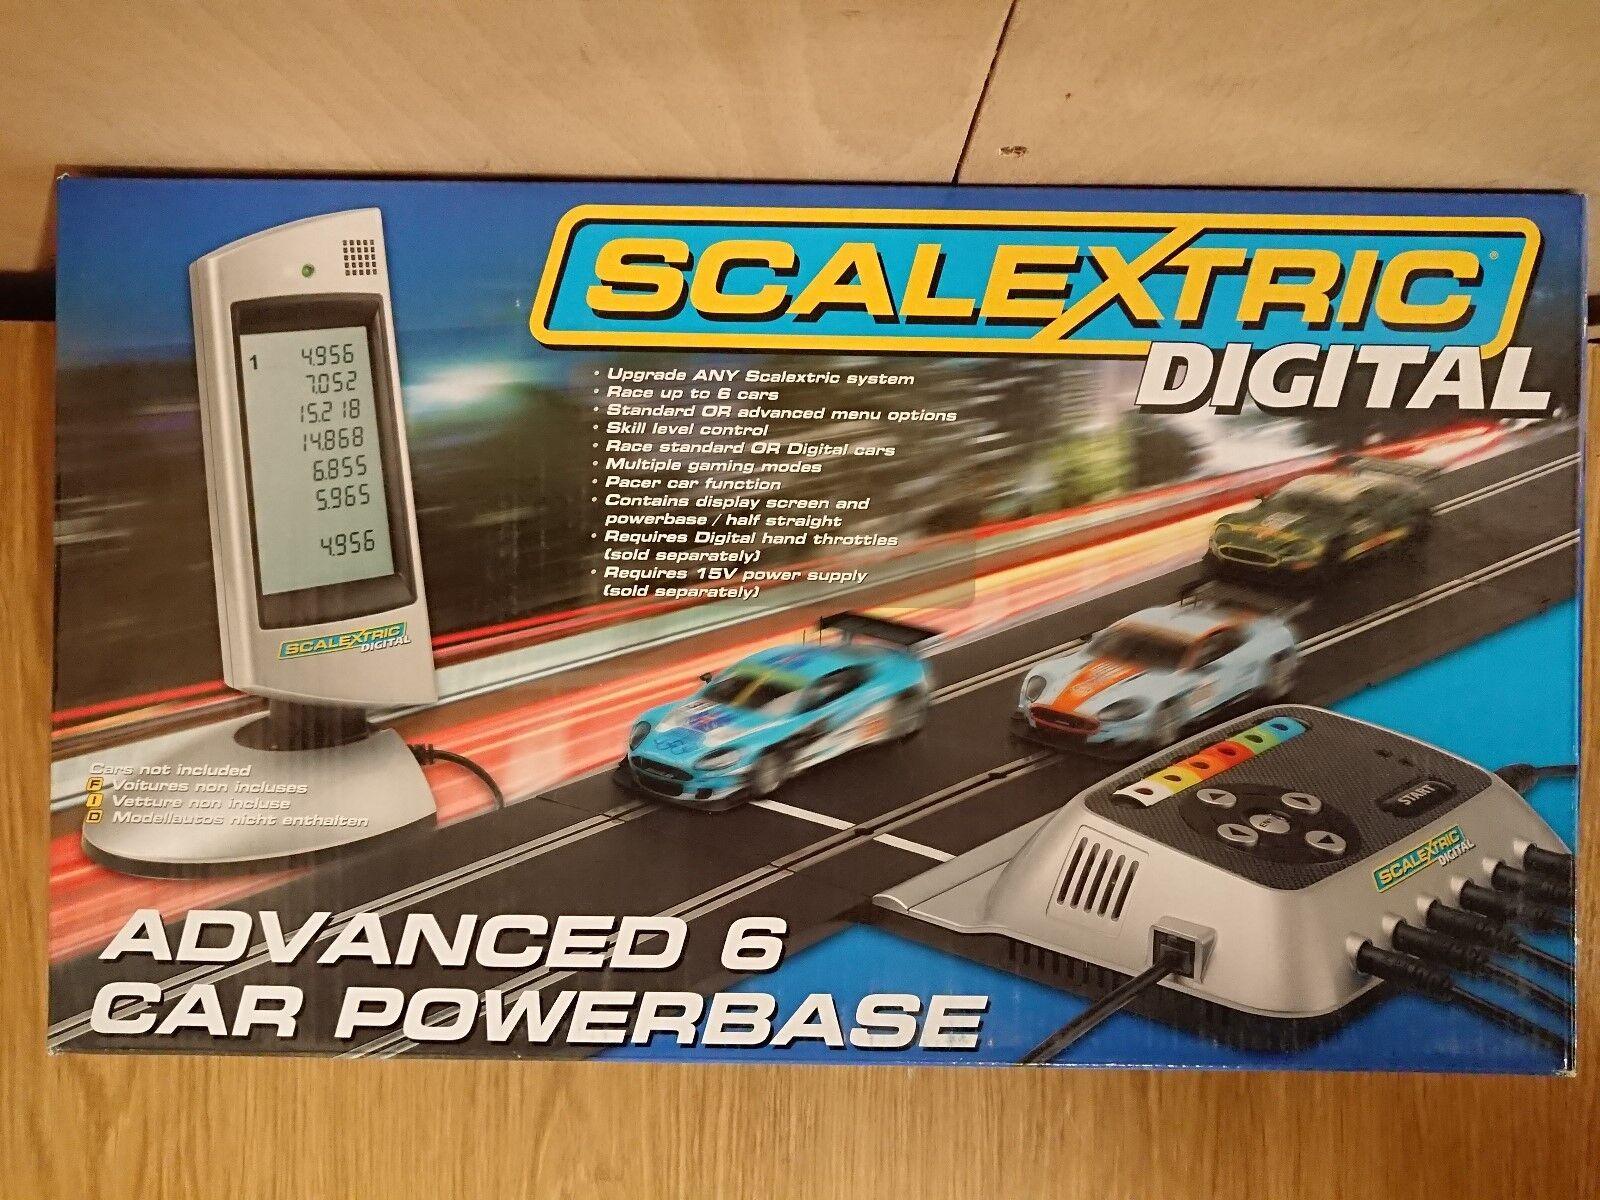 Scalextric C7042 Digital Advanced 6 CAR Powerbase NEW